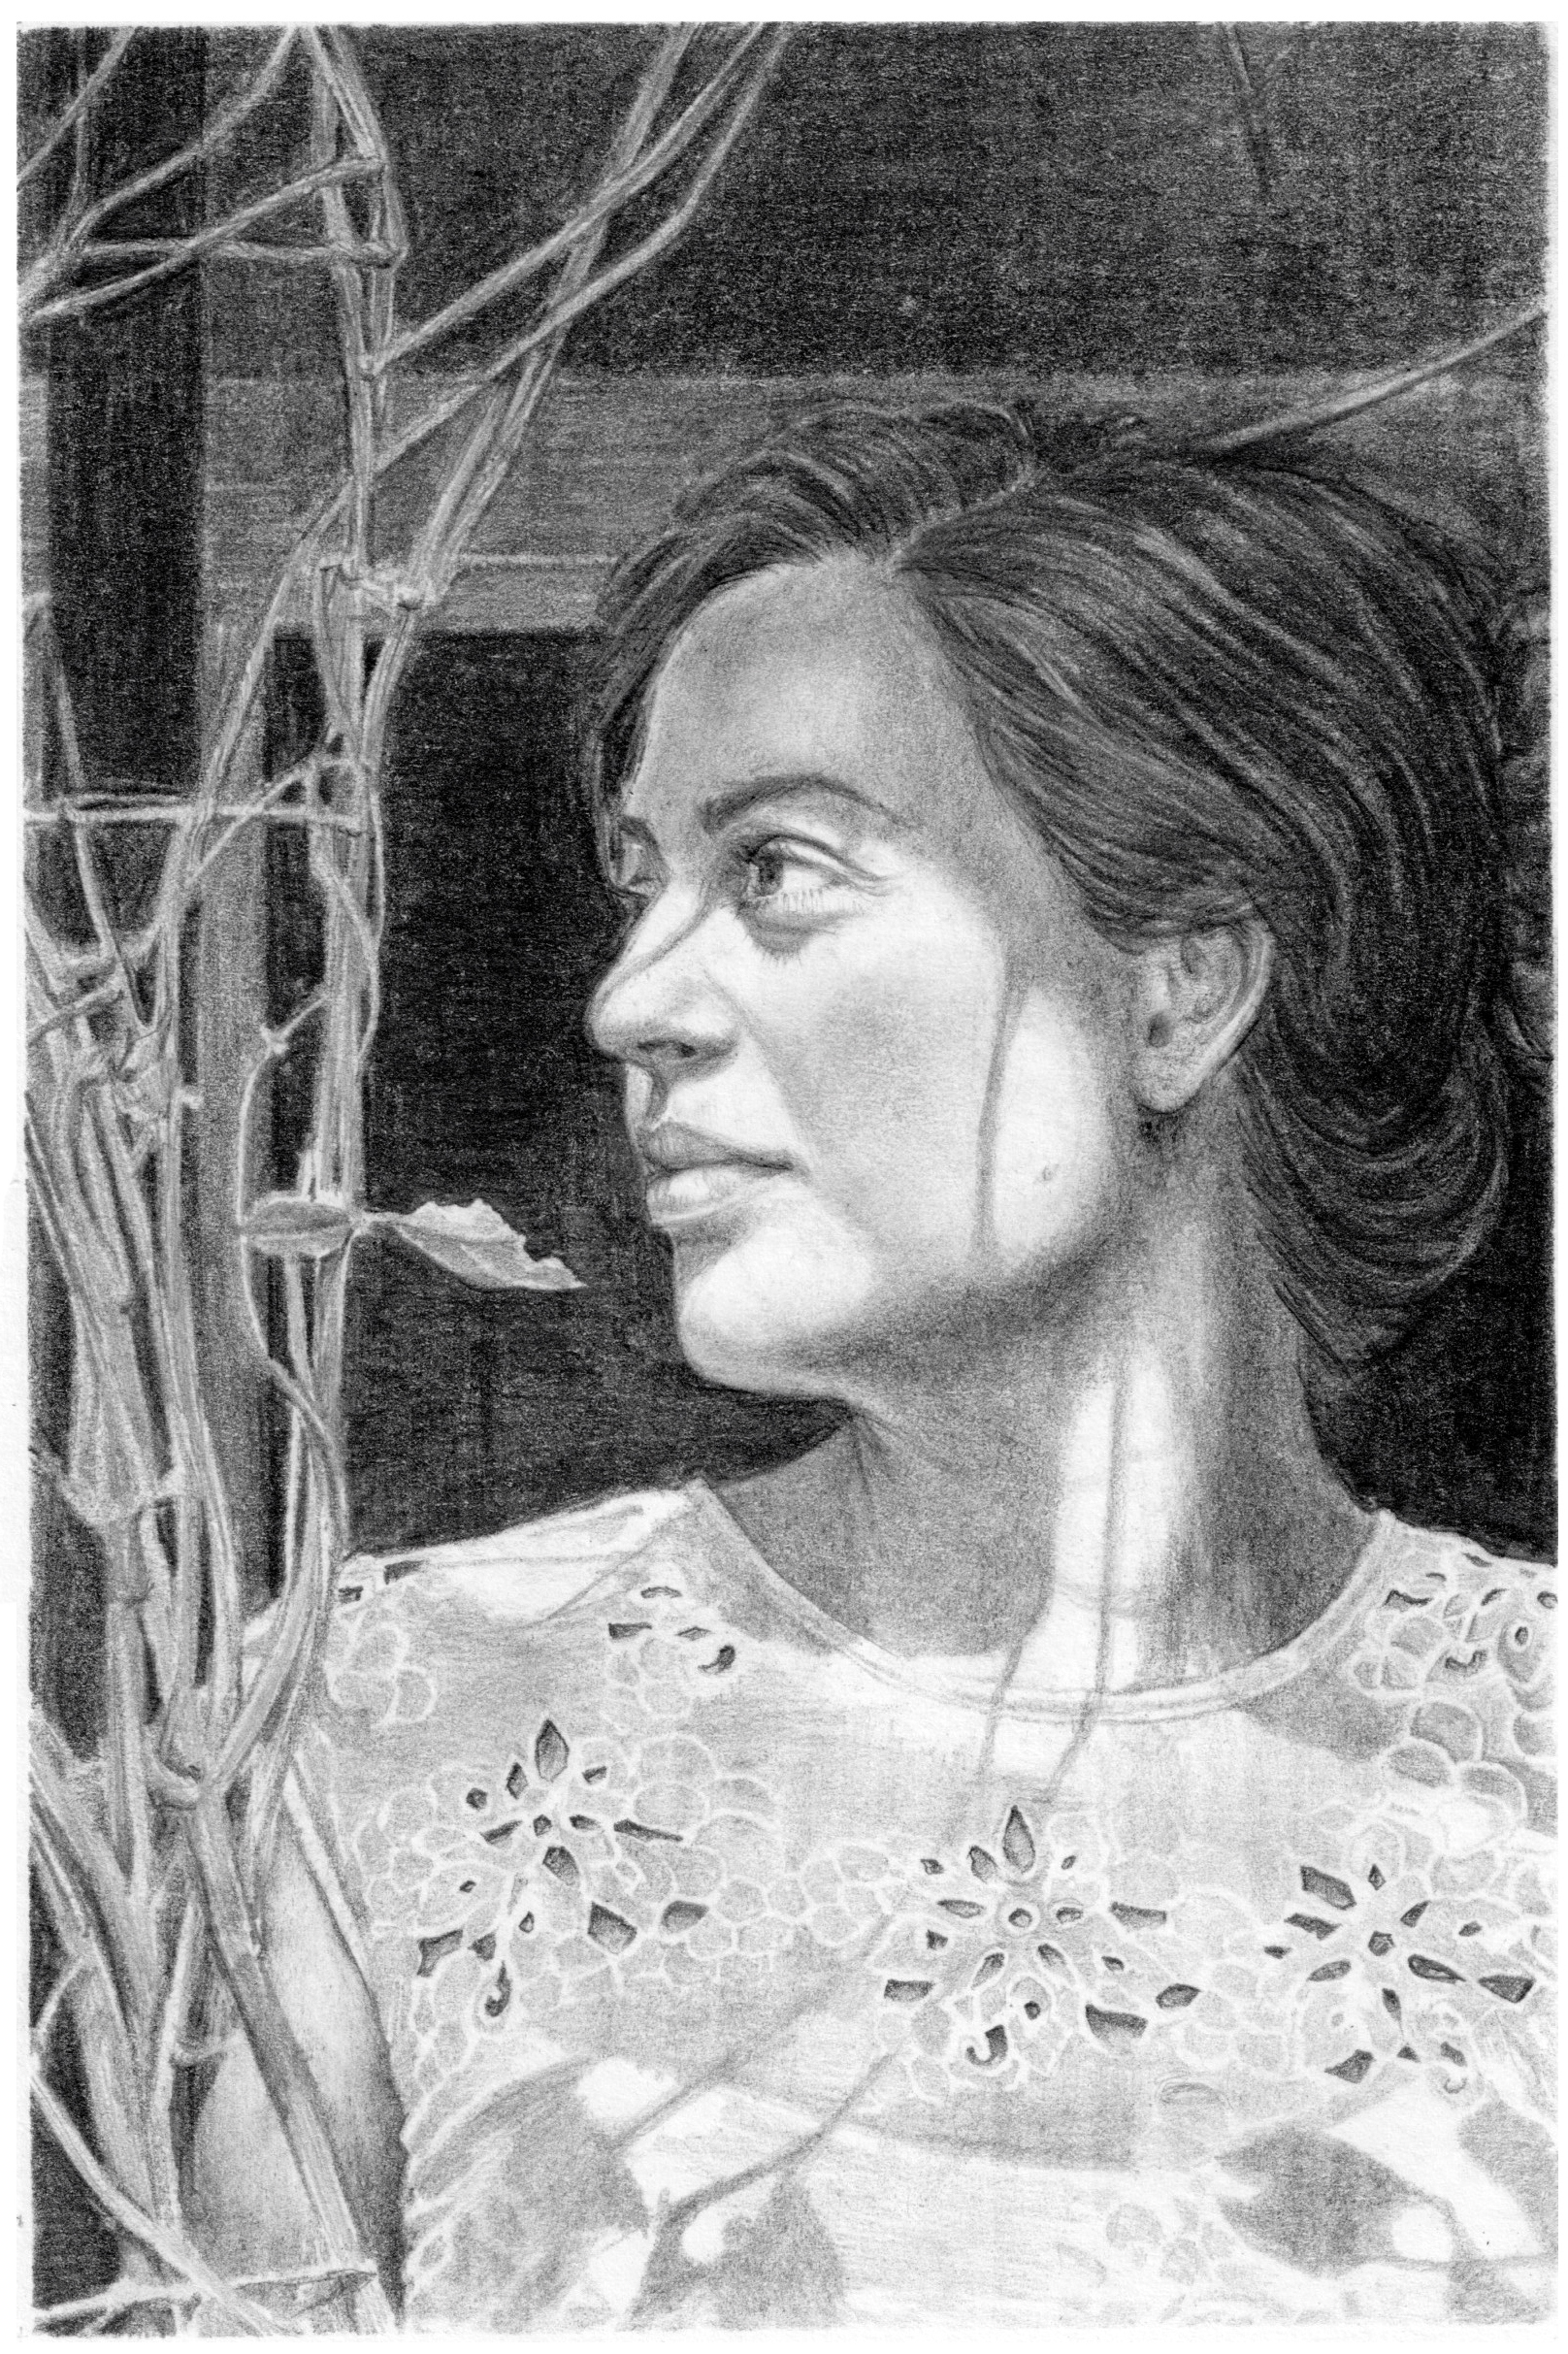 Self-portrait_Sept '11_cropped.jpg